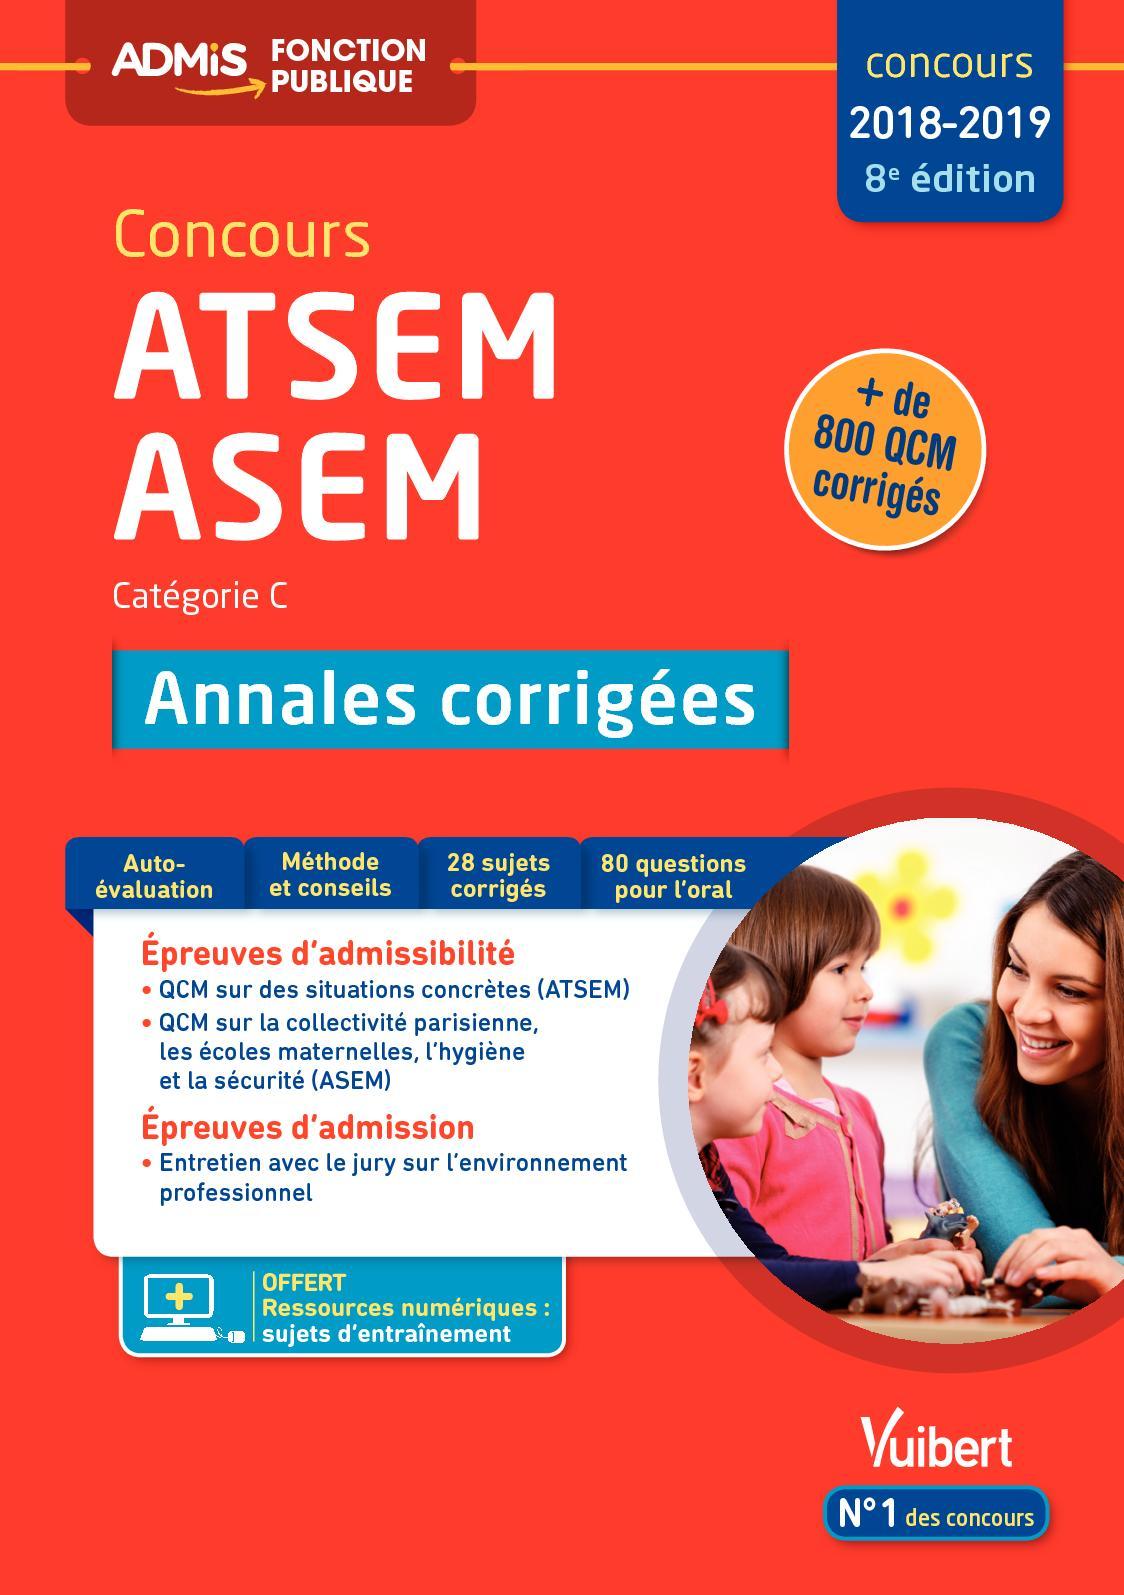 14cdbabf714 Calaméo - Extrait Concours ATSEM ASEM - Annales corrigées